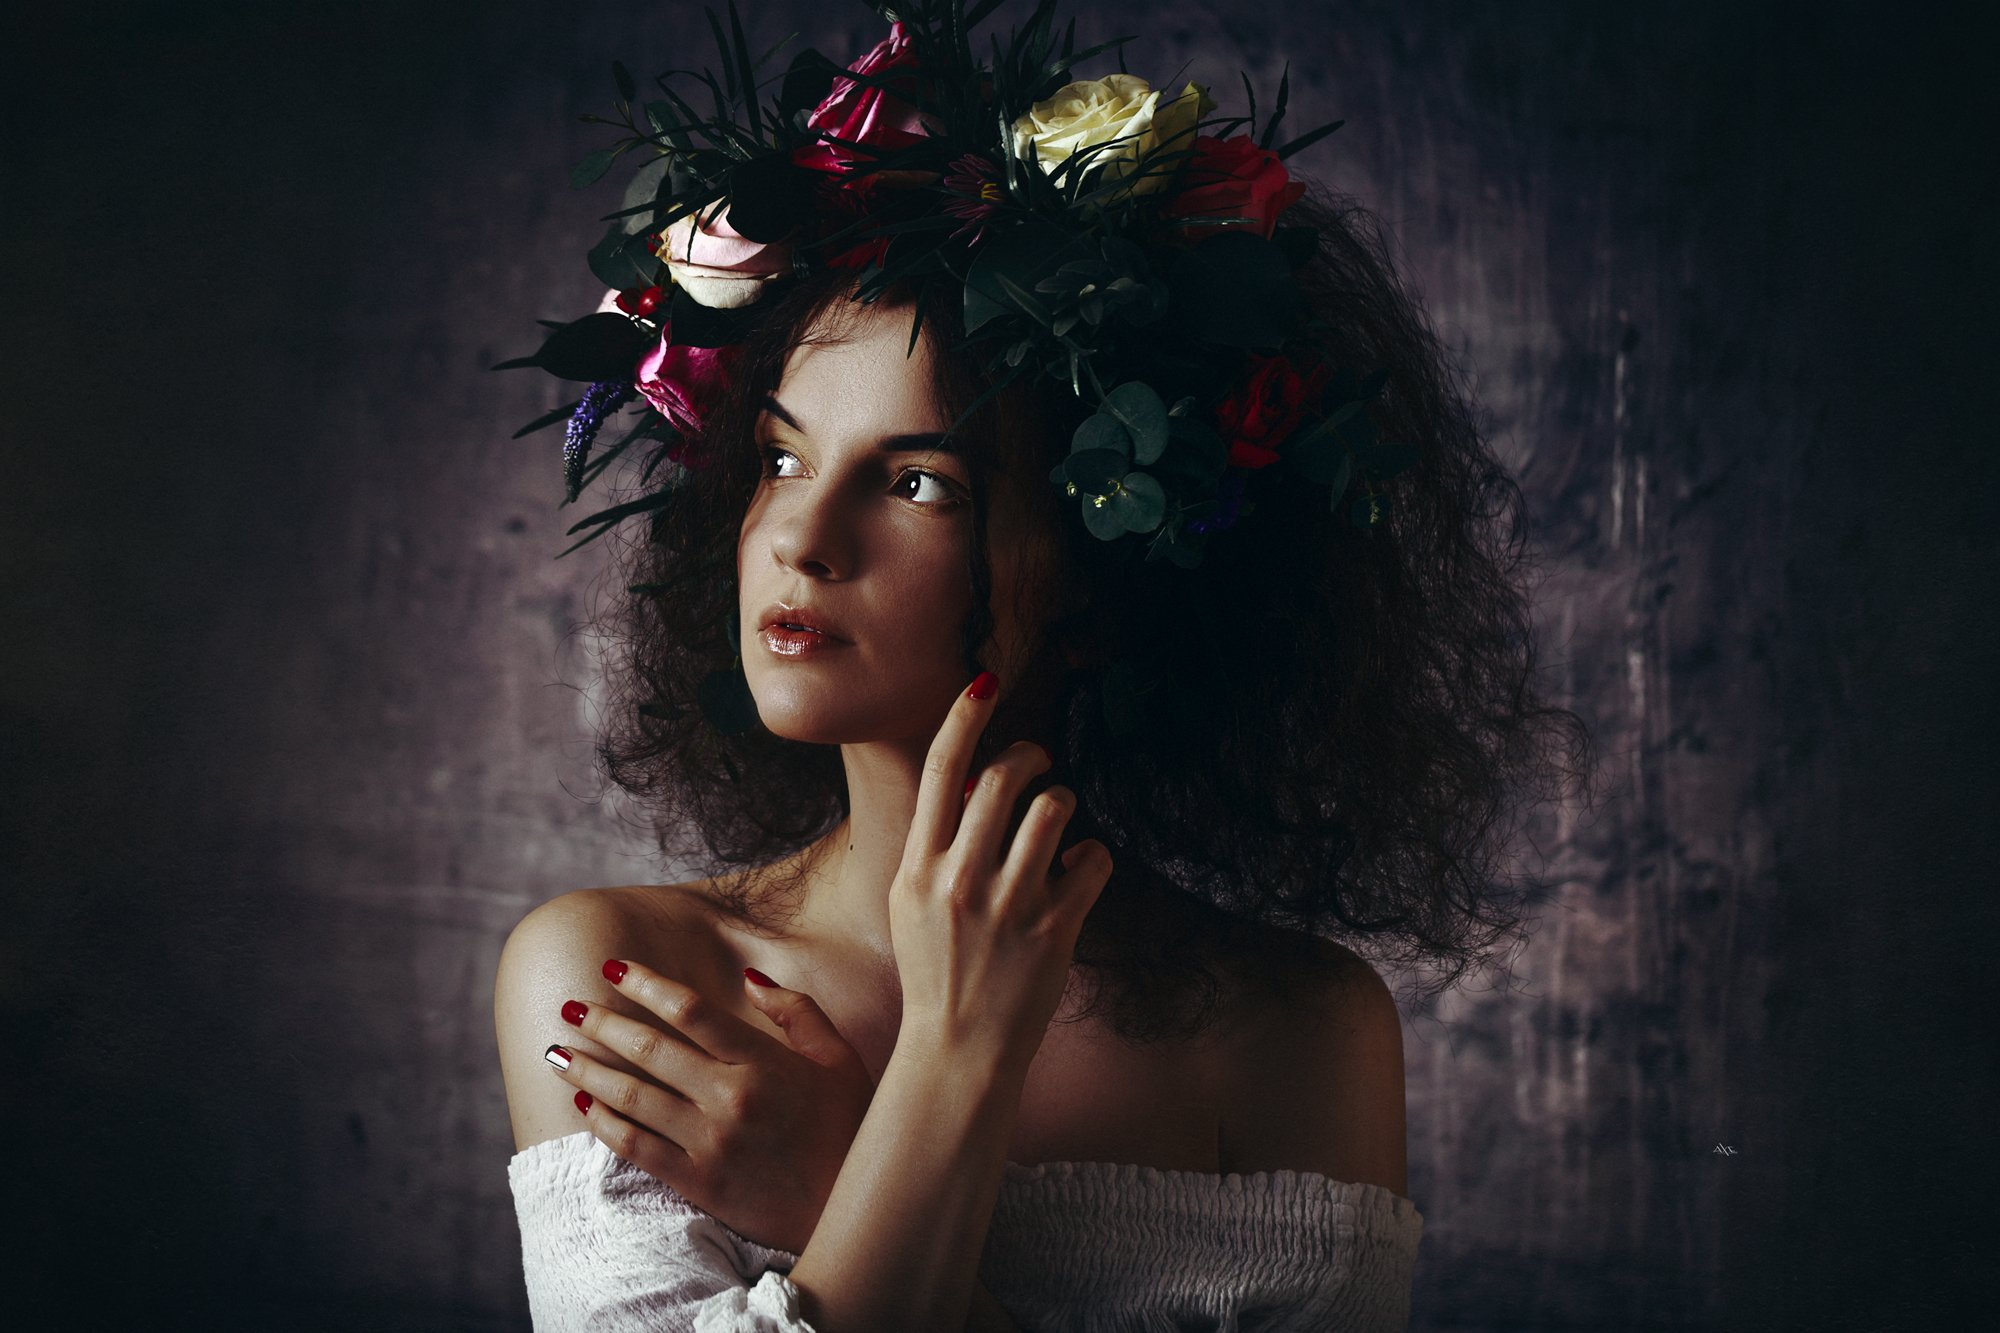 woman, beauty, art, studio, light, portrait, Руслан Болгов (Axe)